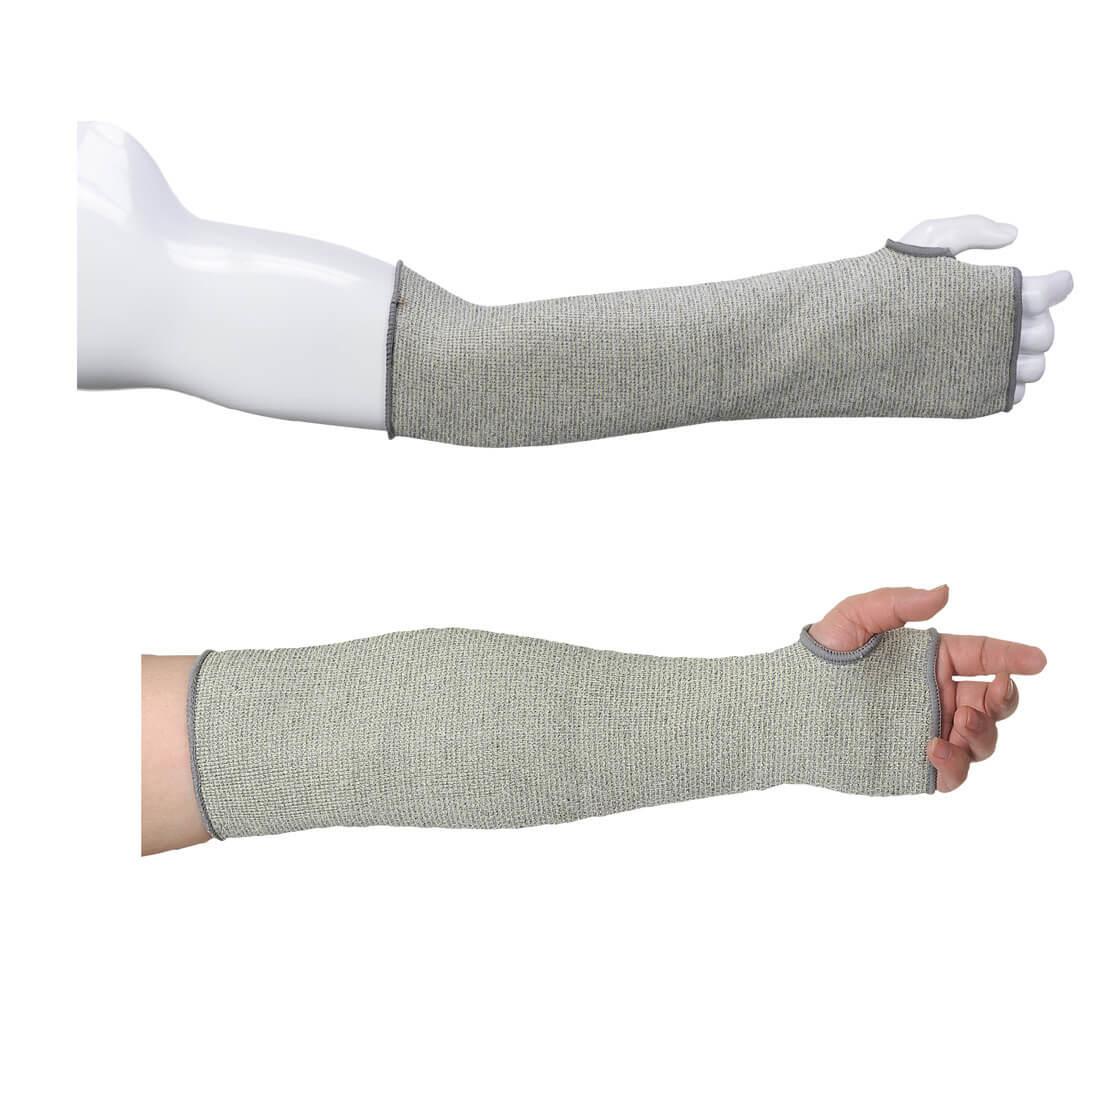 Maneca Antitaiere 45 cm - Echipamente de protectie personala